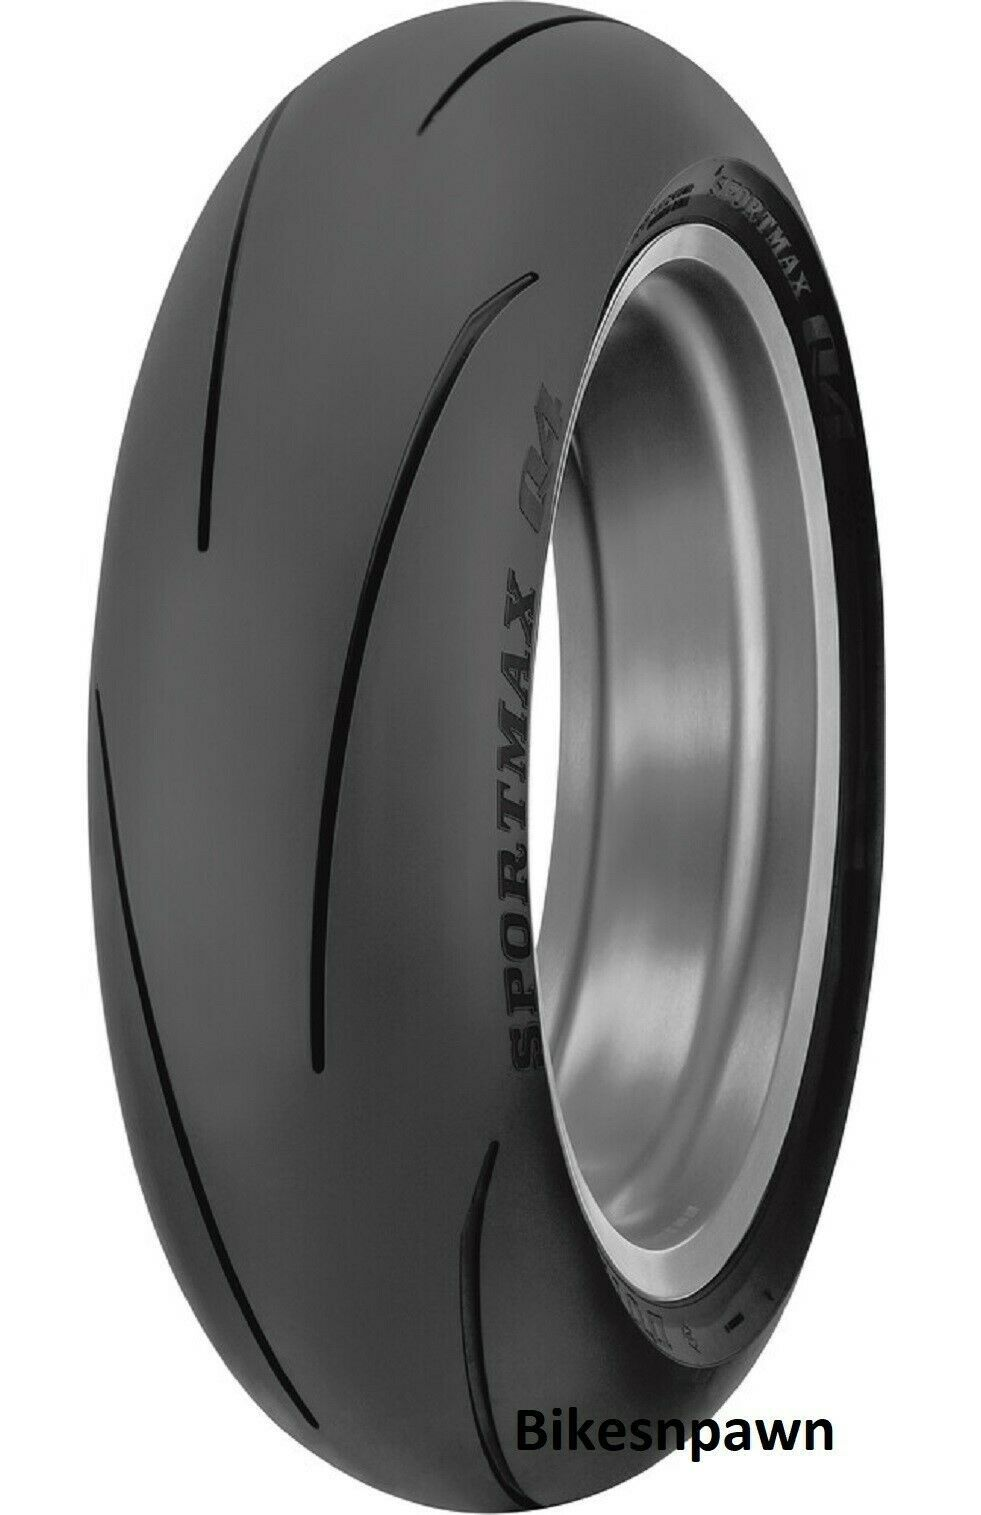 New 180/60ZR17 Dunlop Q4 Sportmax Rear Radial Motorcycle Tire 75W TL